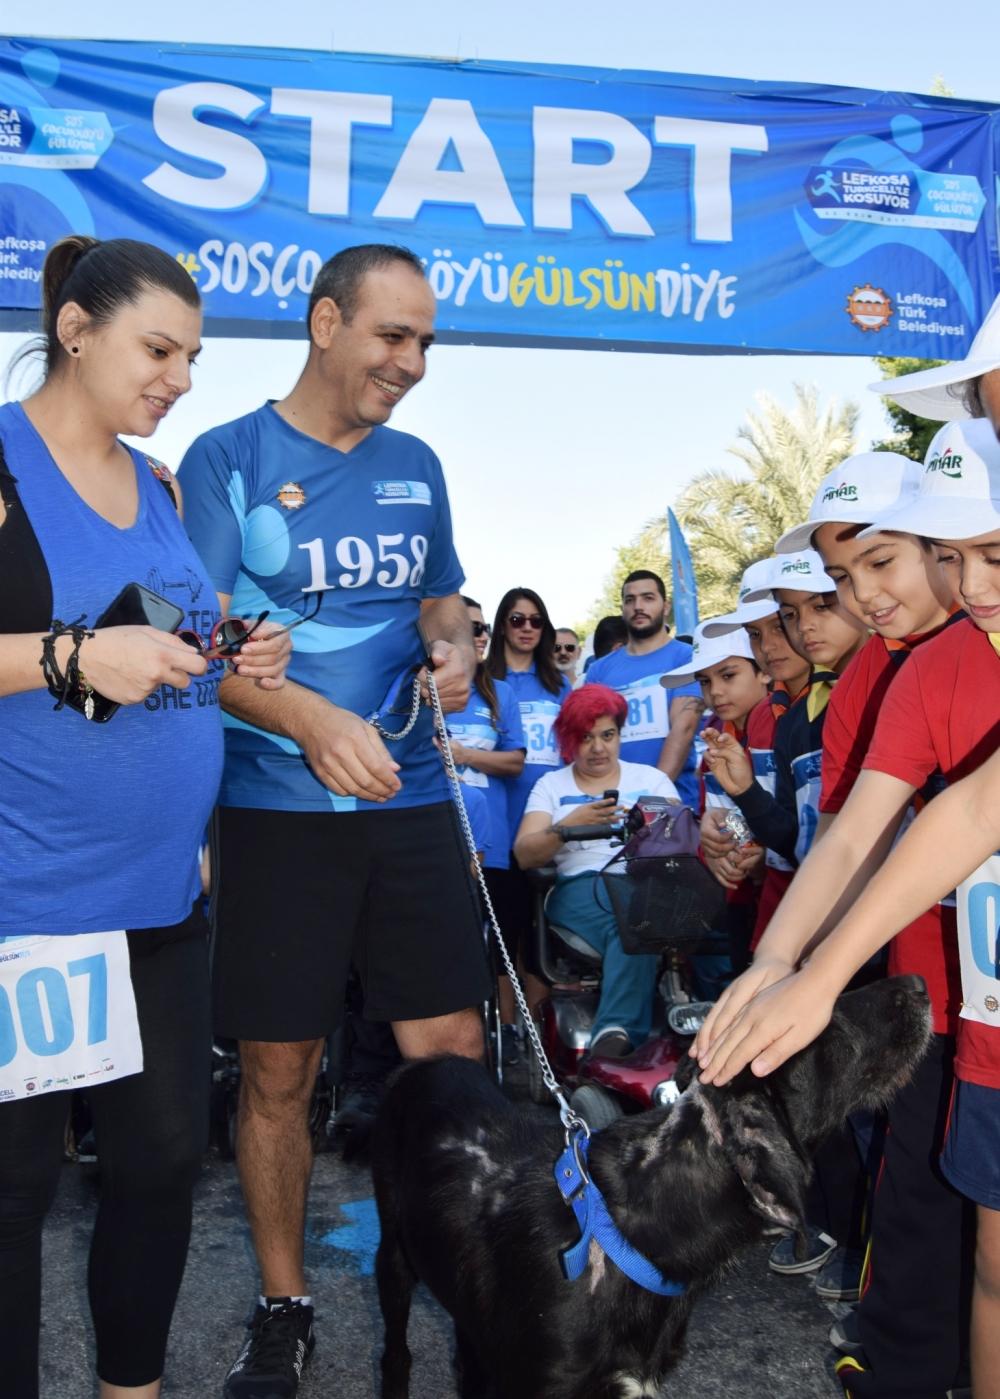 Lefkoşa Turkcell ile Koşuyor Maratonuı 20